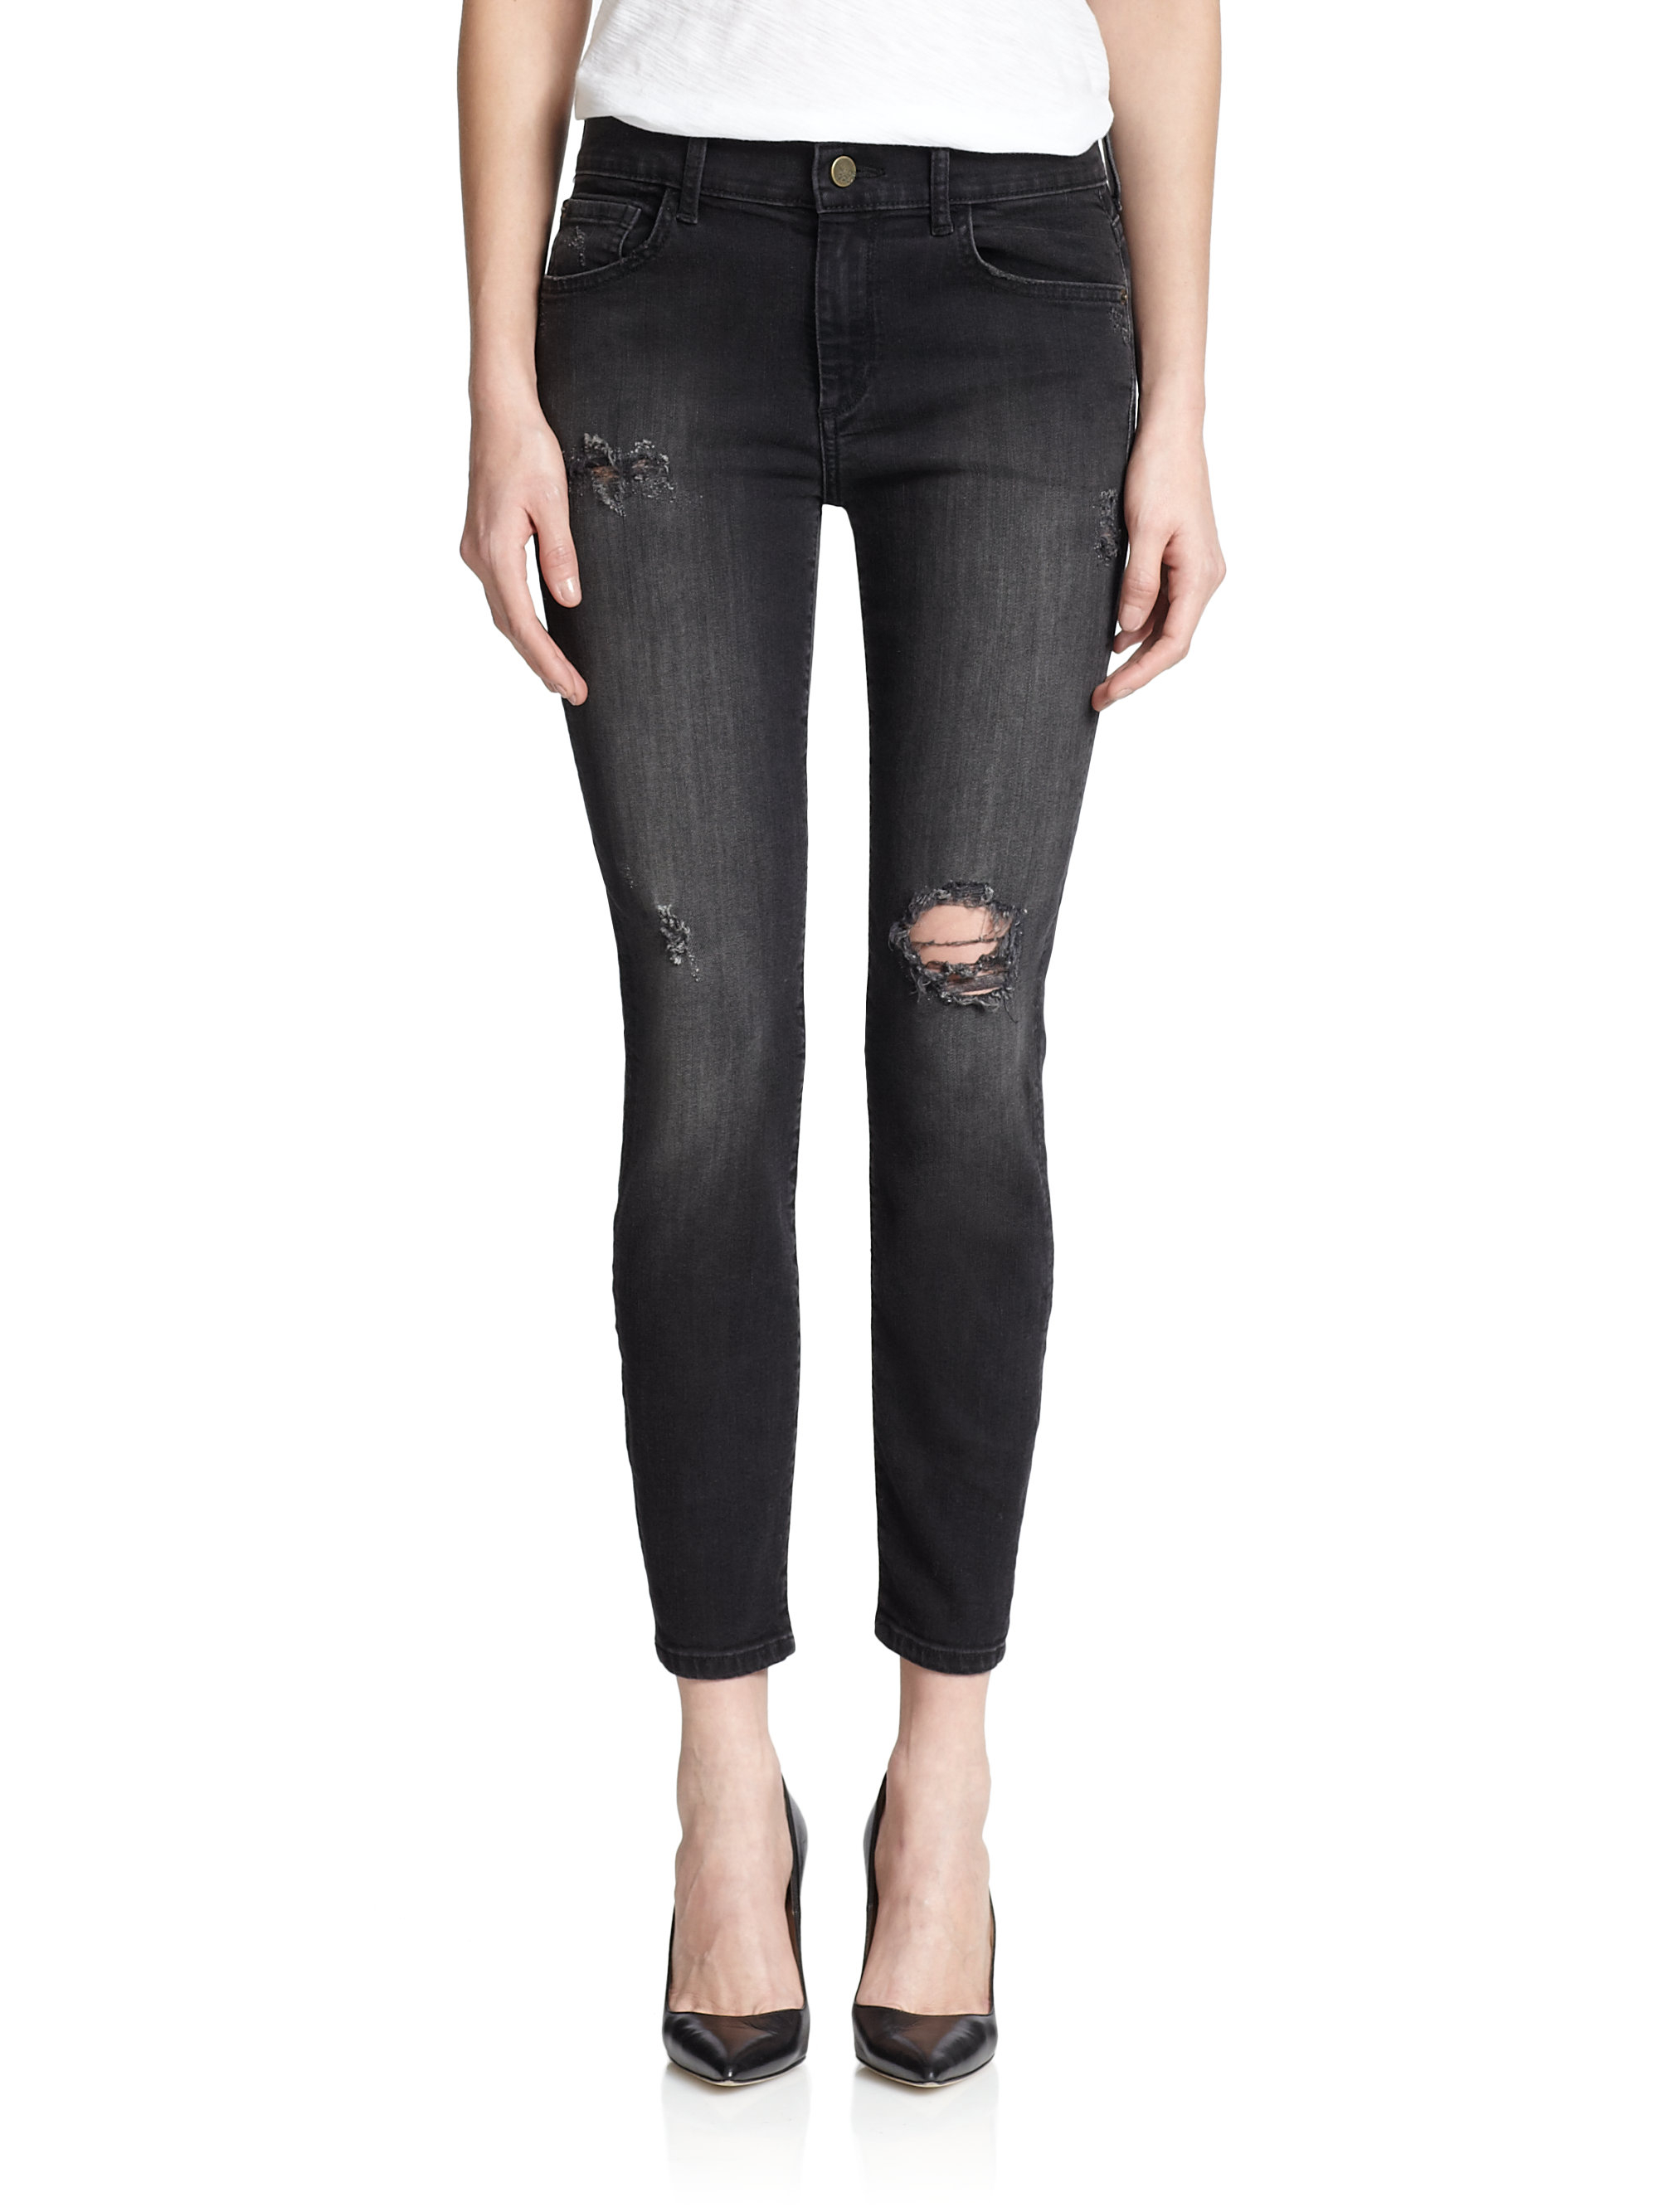 lyst madegold distressed low rise skinny jeans in blue. Black Bedroom Furniture Sets. Home Design Ideas